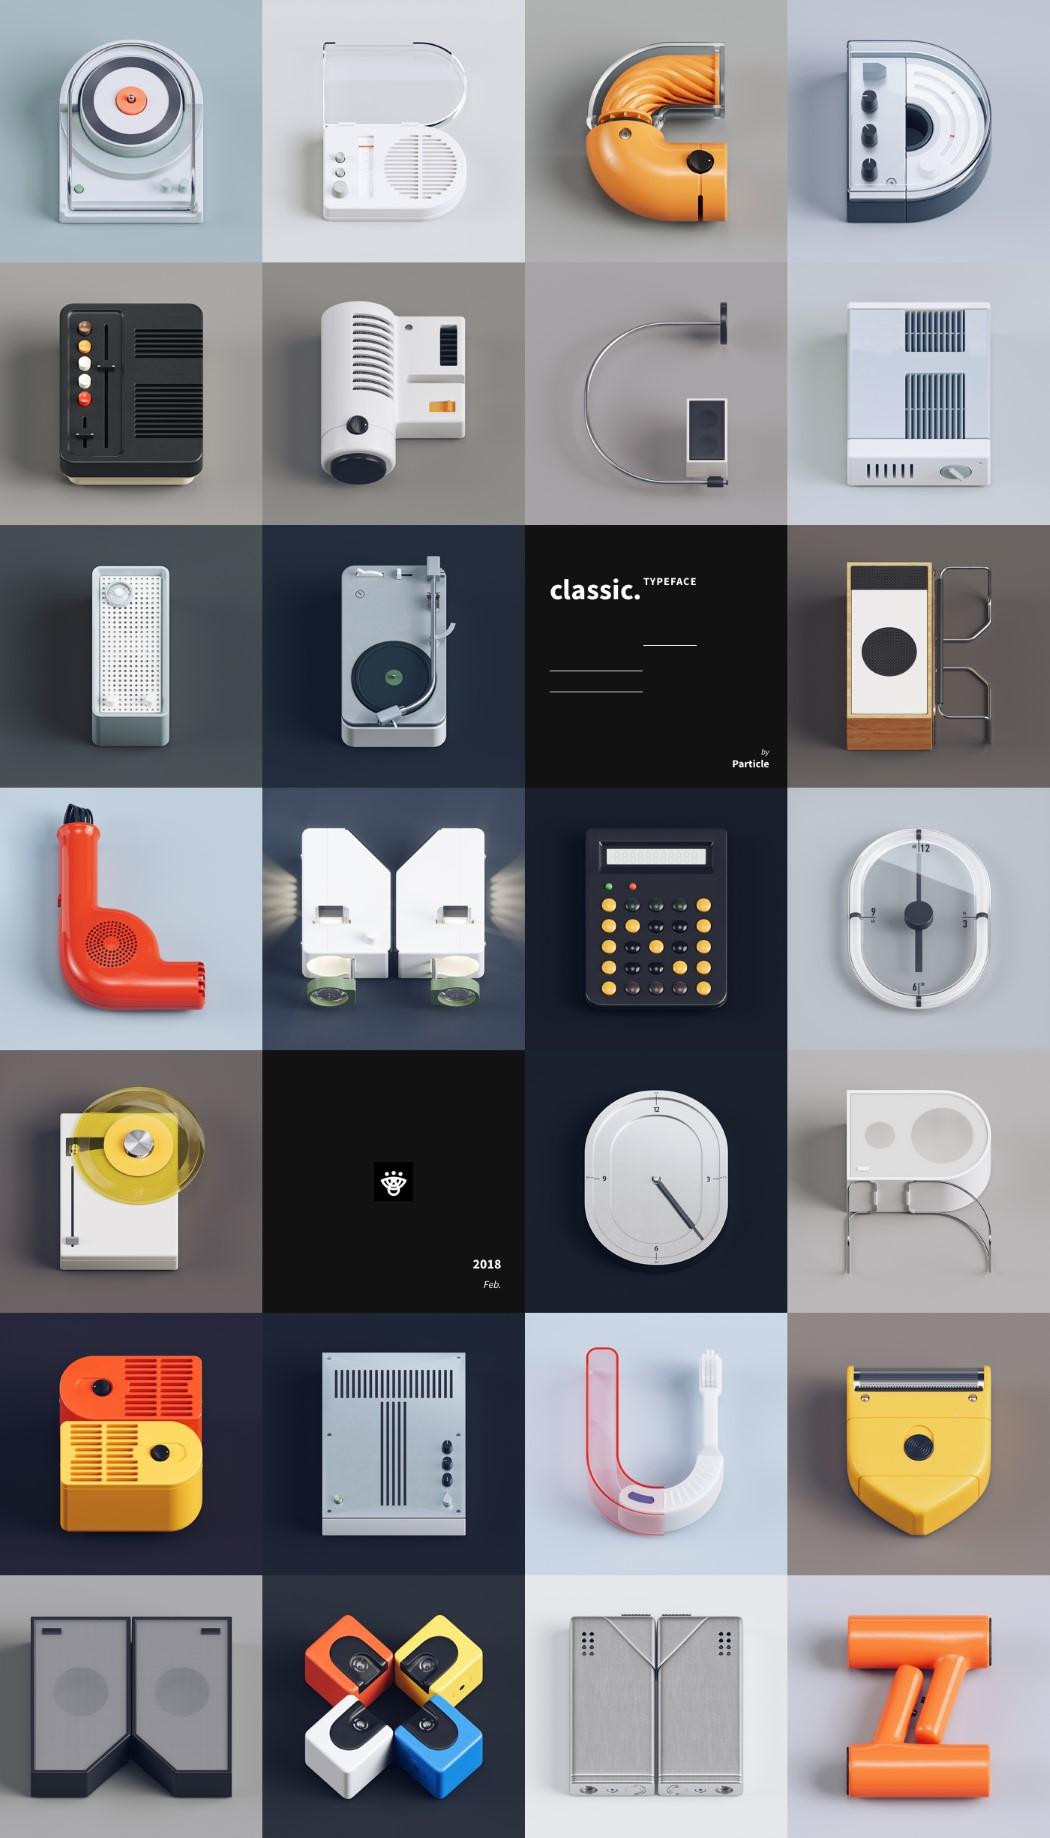 Braun product design turned into the alphabet